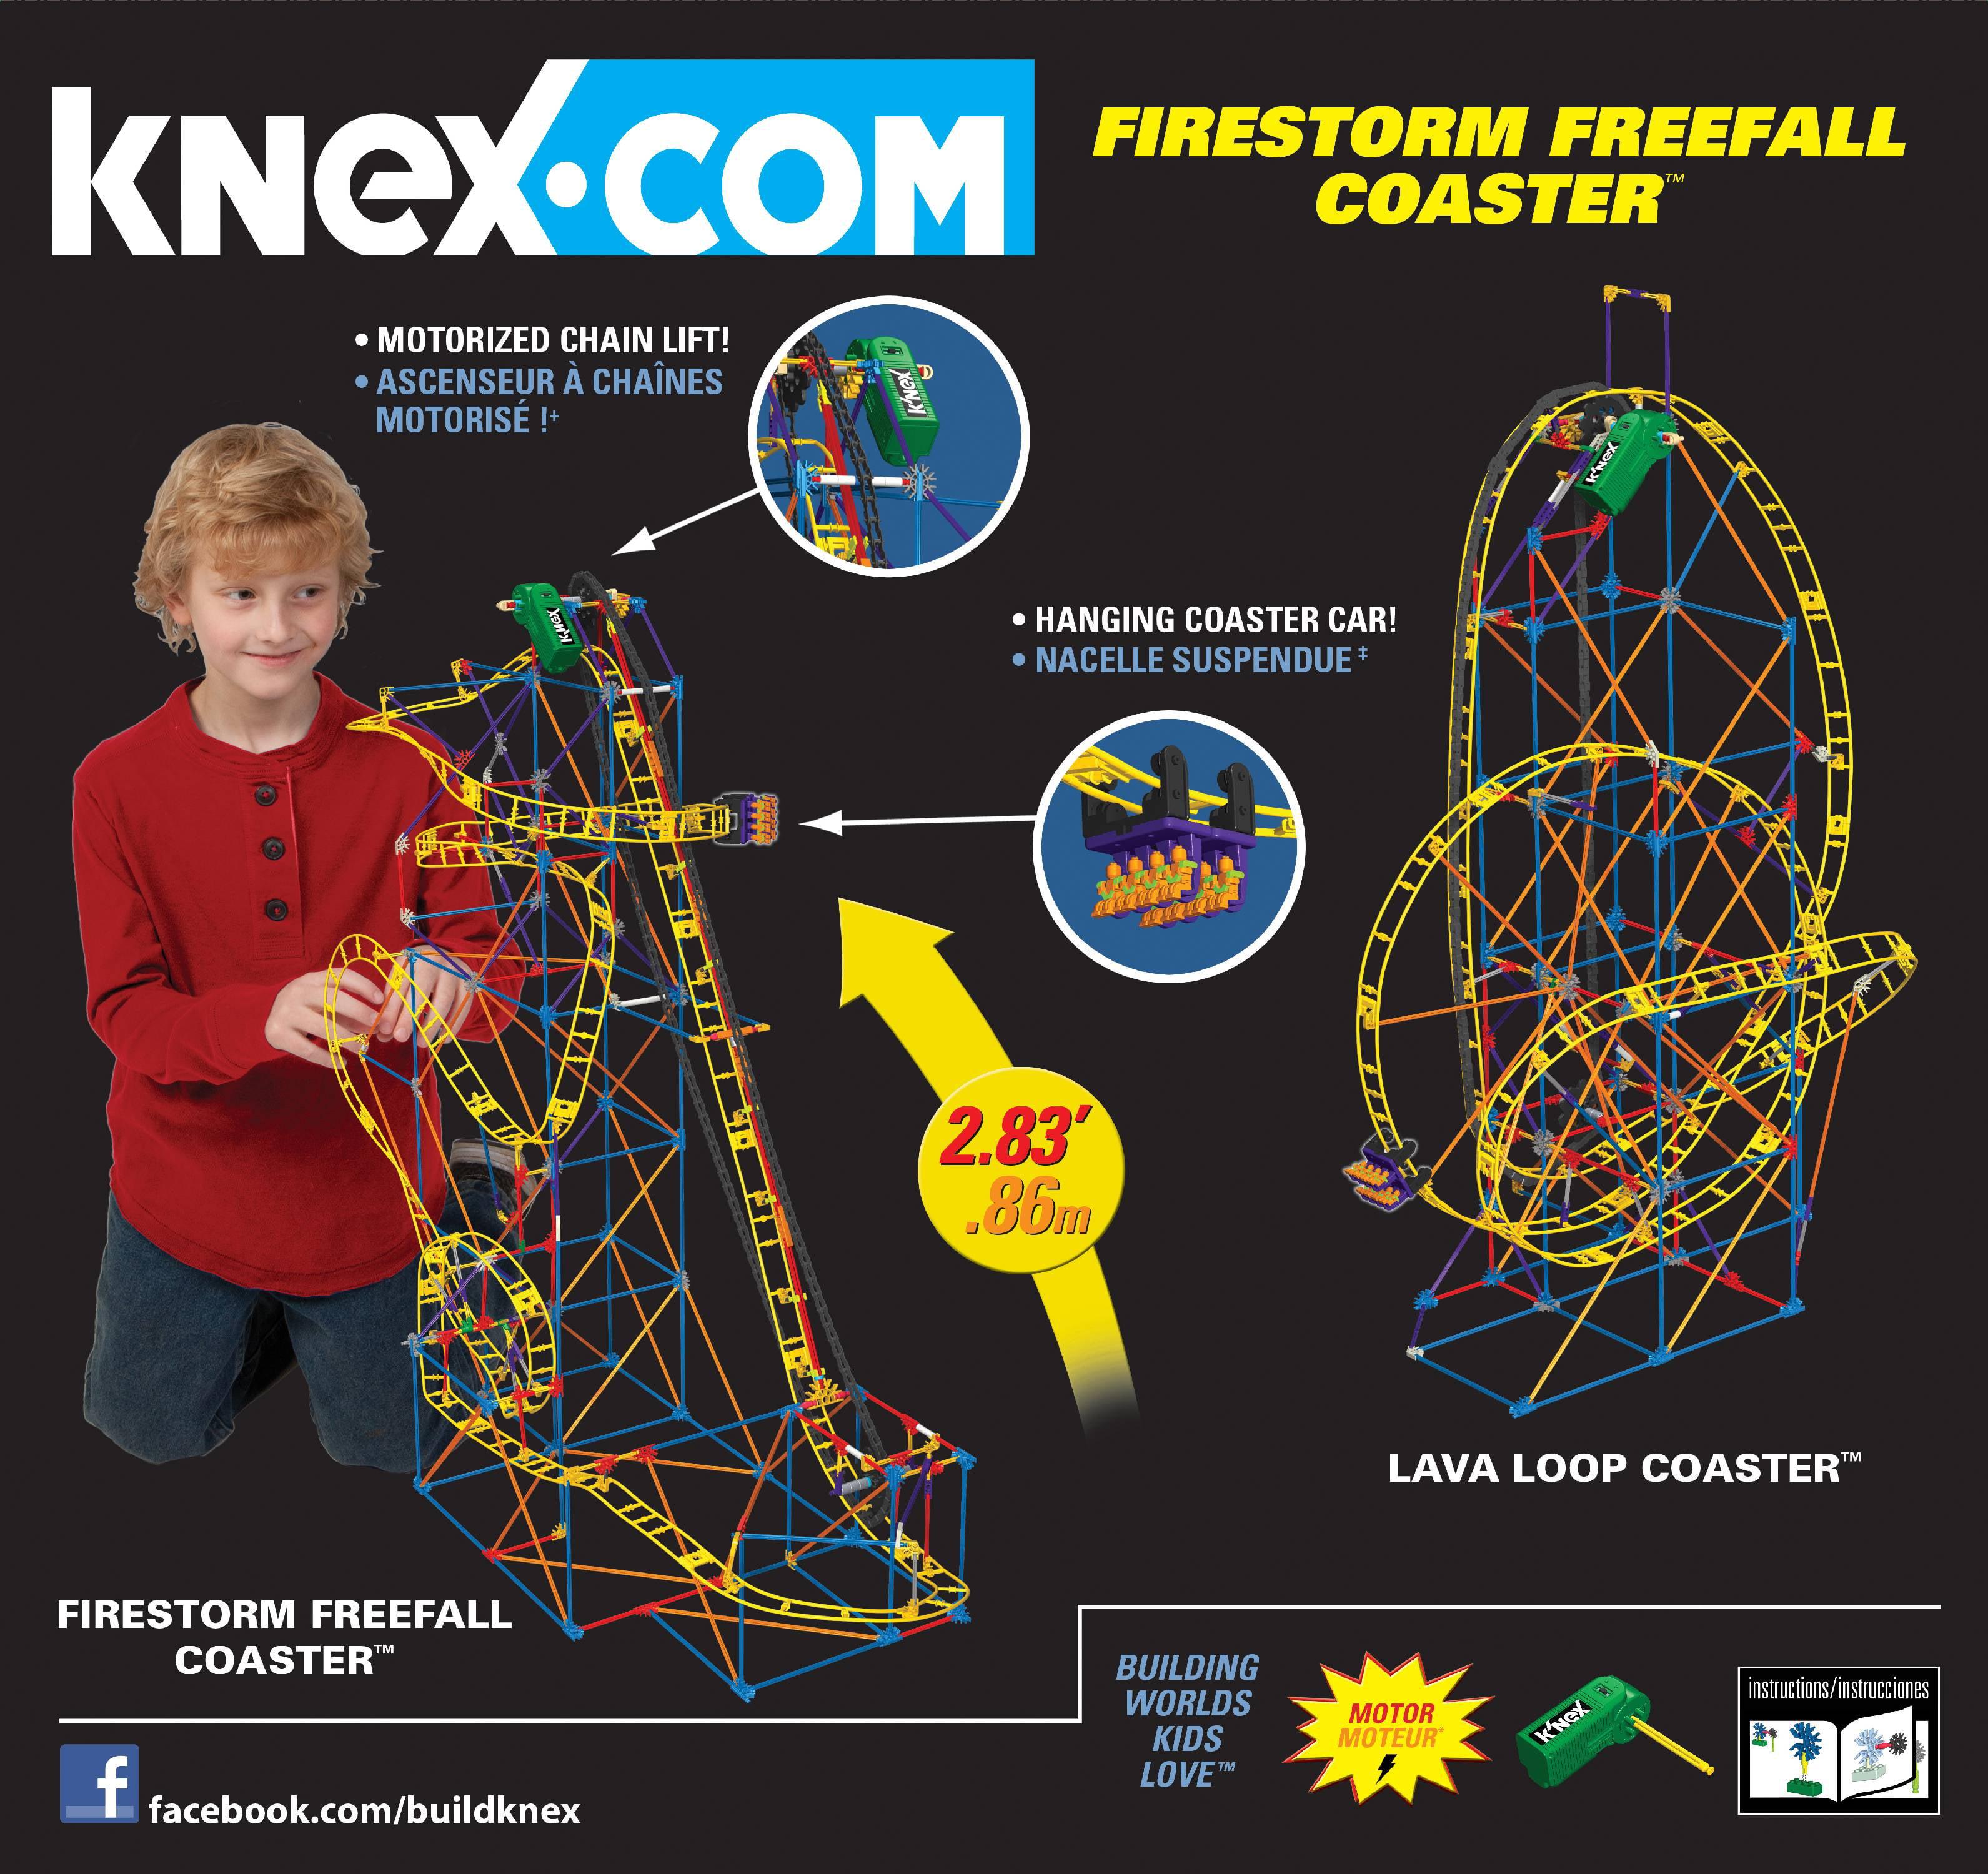 Knex vertical viper roller coaster 12435 k'nex instruction manual.